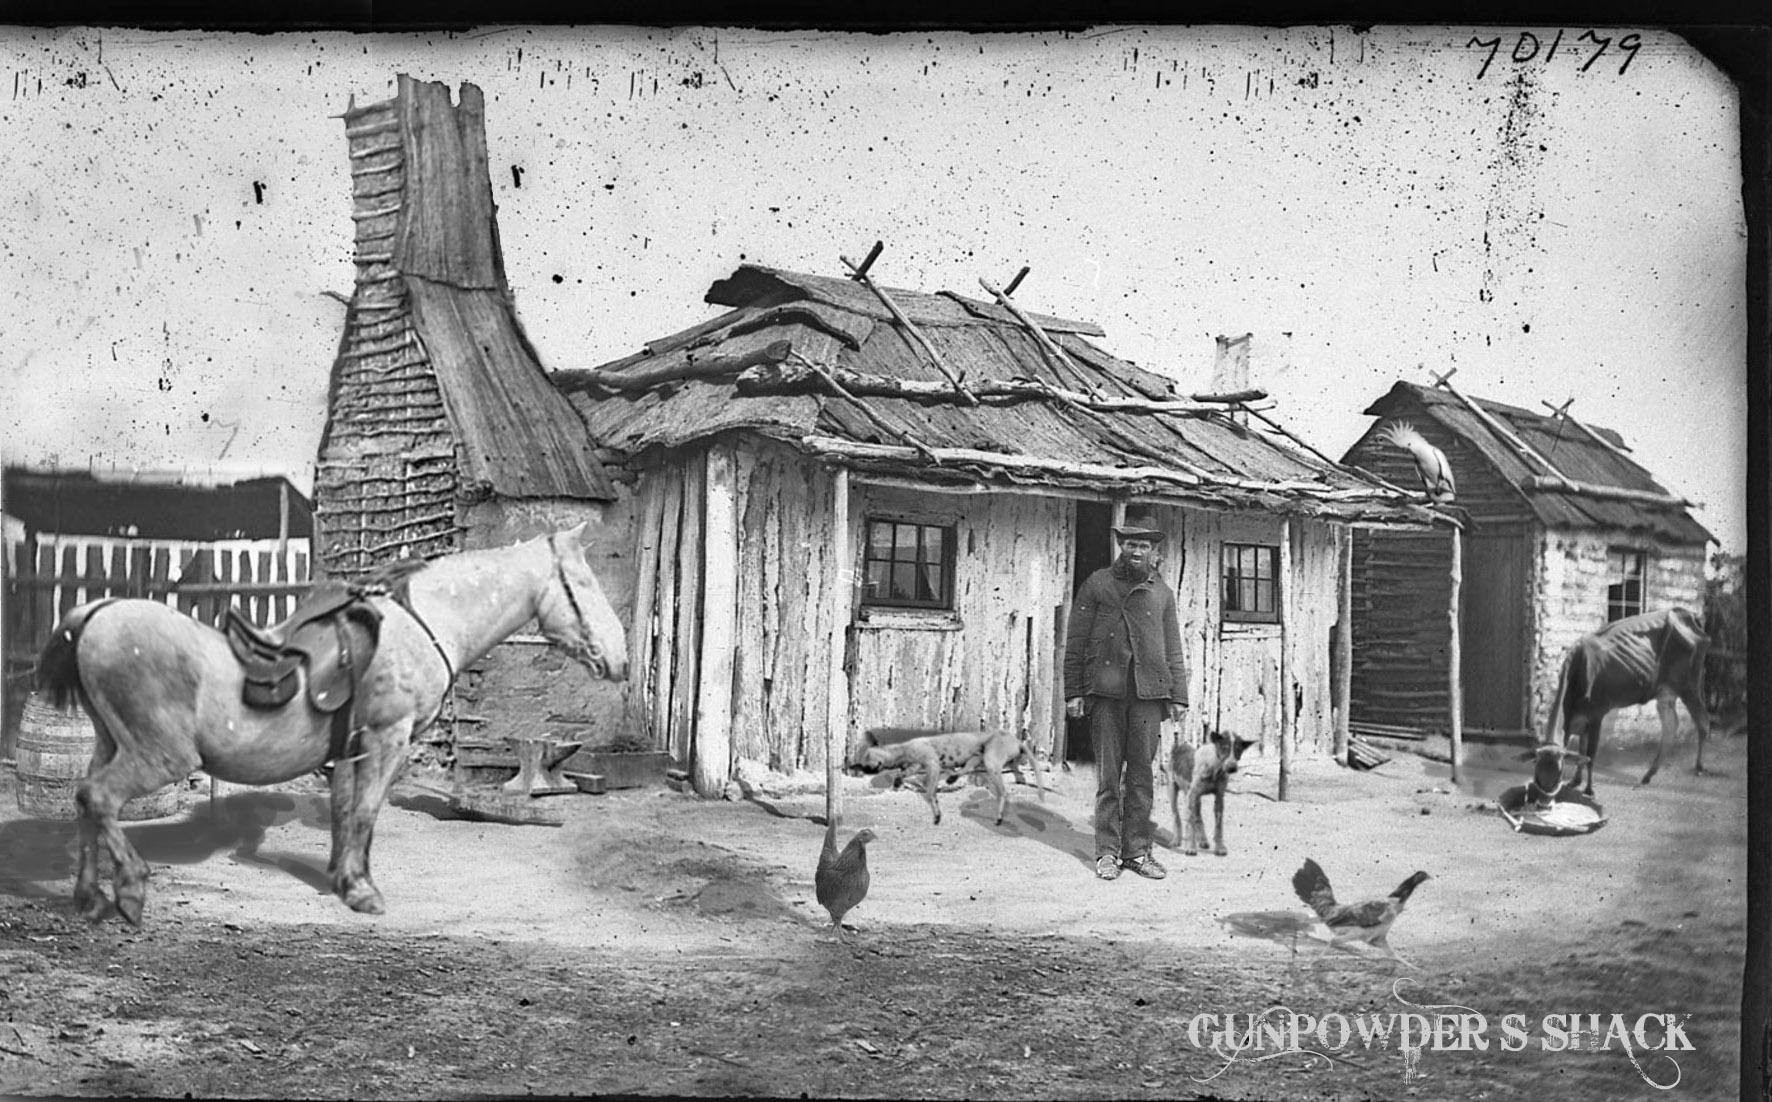 gunpowder's shack1 copy 3.jpg